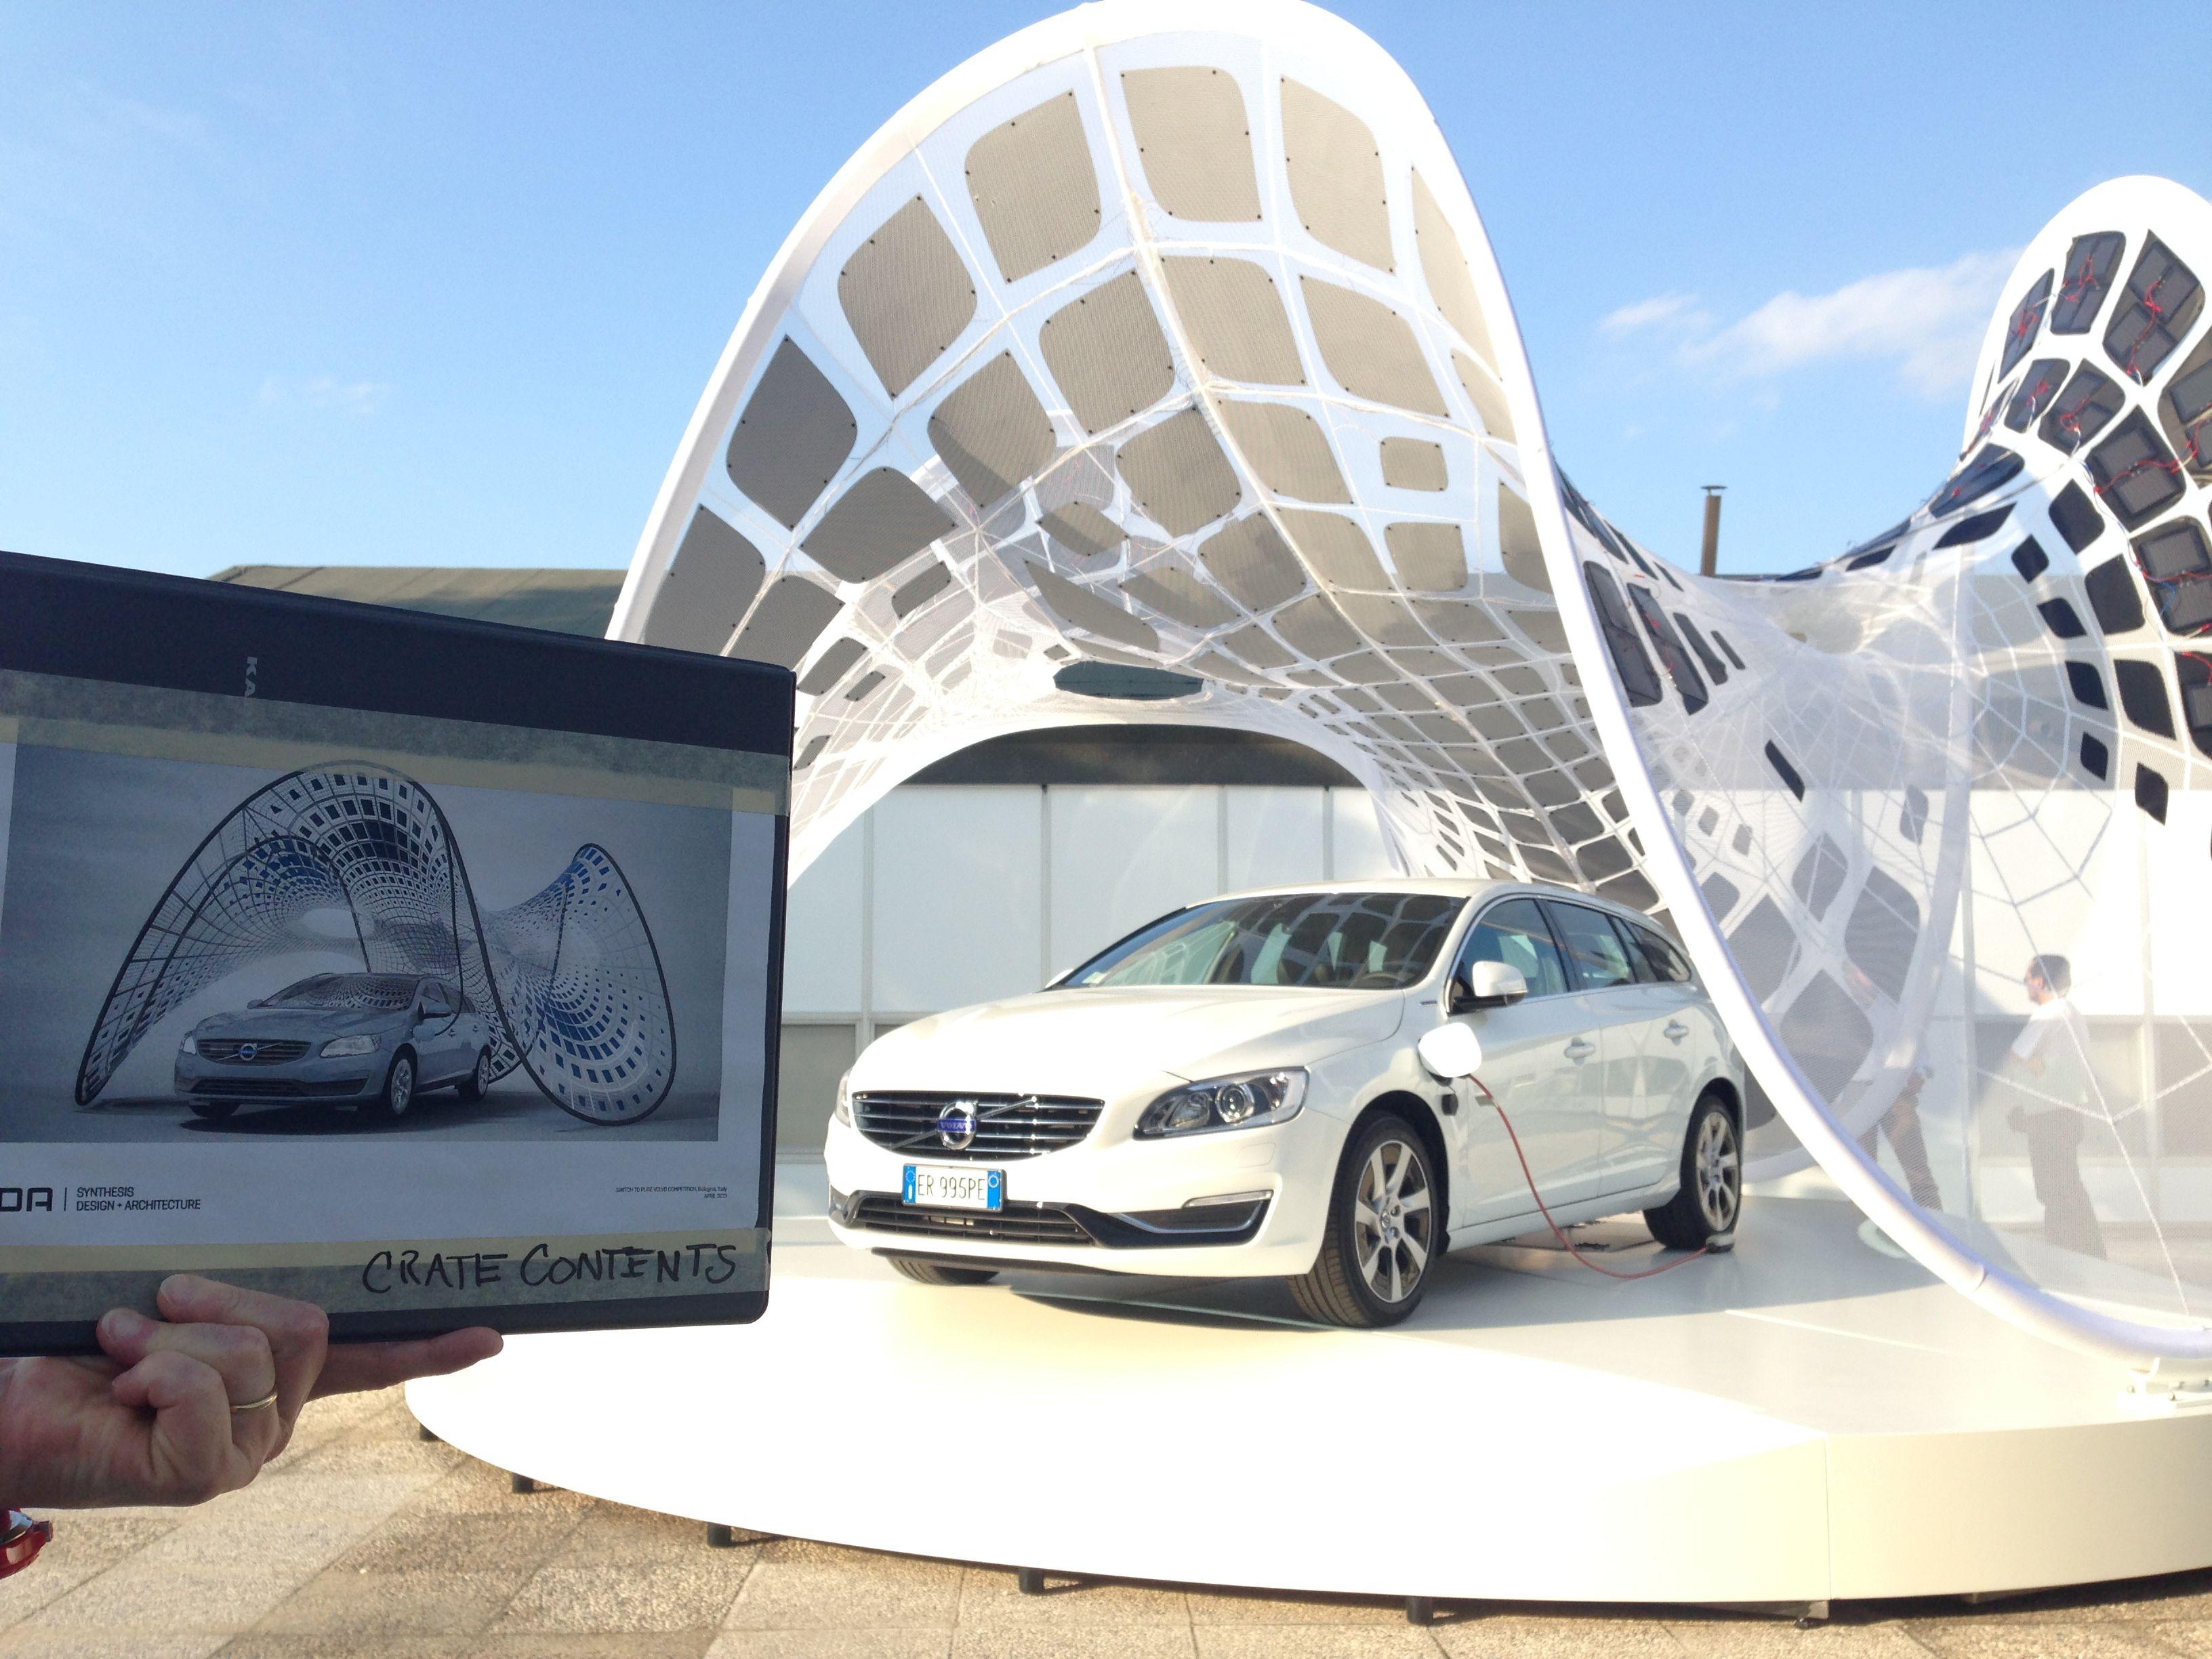 The Conceptual Solar Powerd Pure Tension Volvo Pavilion